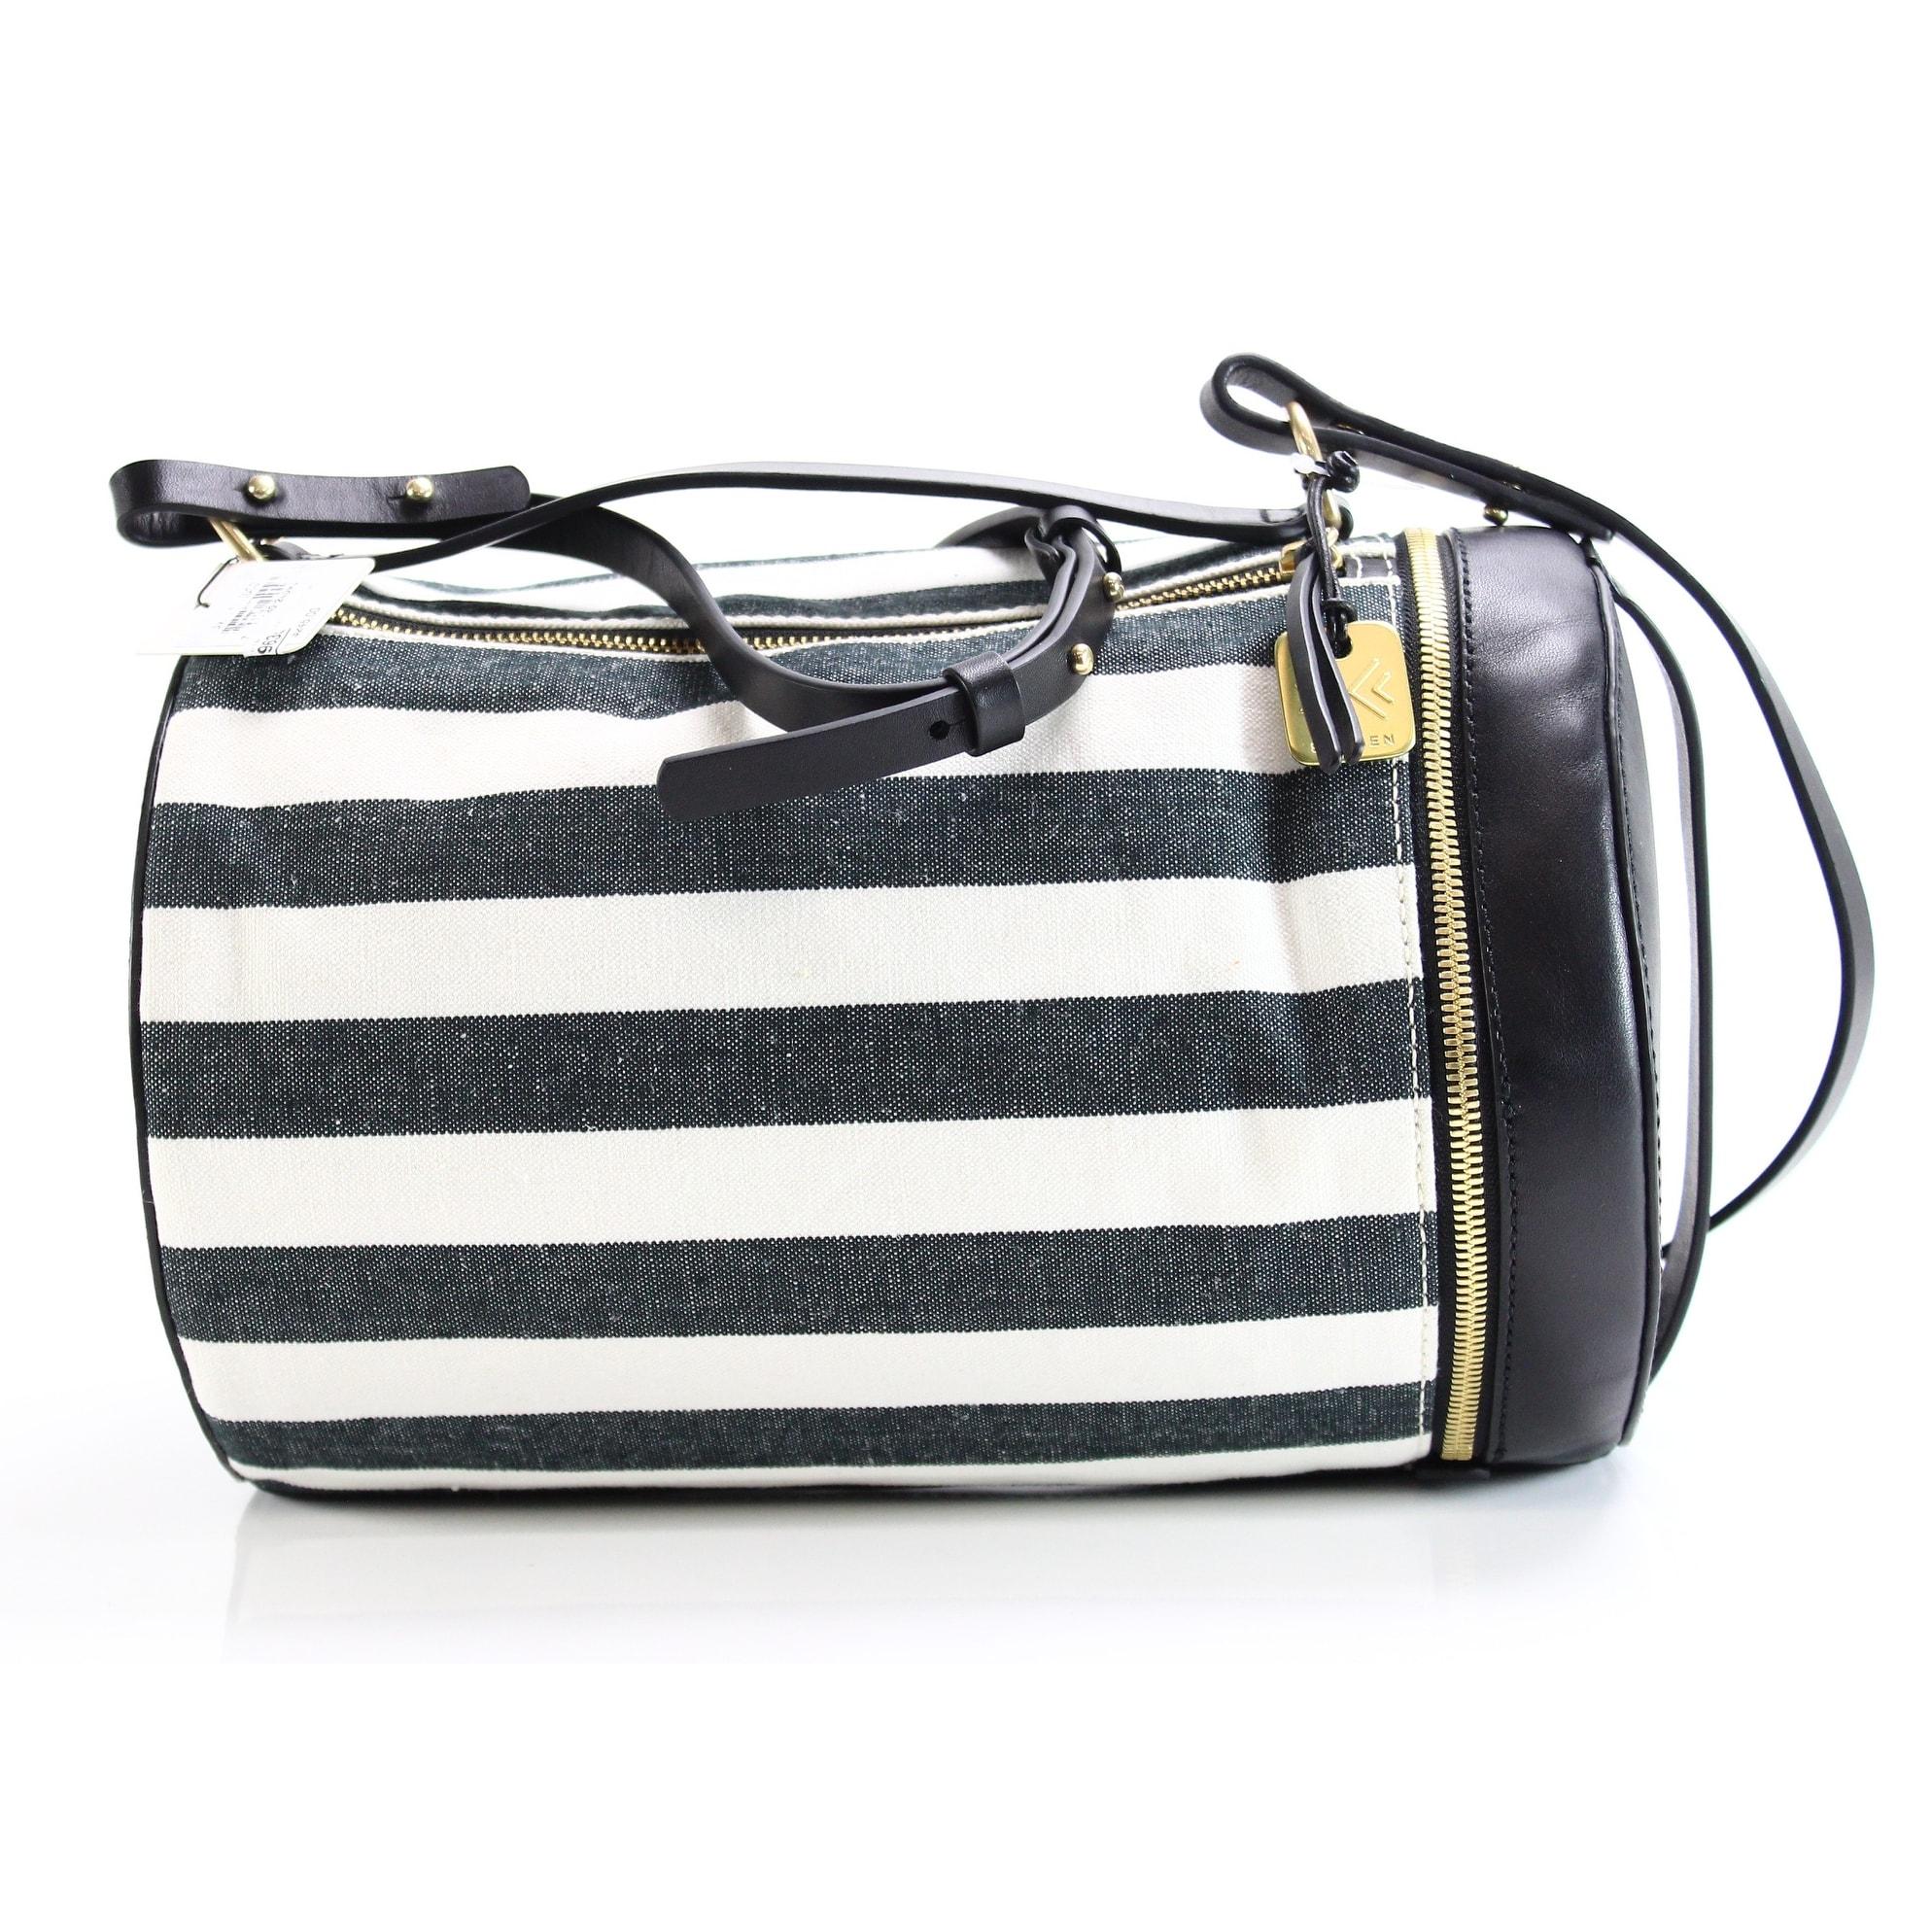 Skagen Black White Stripe Trisse Barrel Satchel Handbag Purse Free Shipping Today 25966105